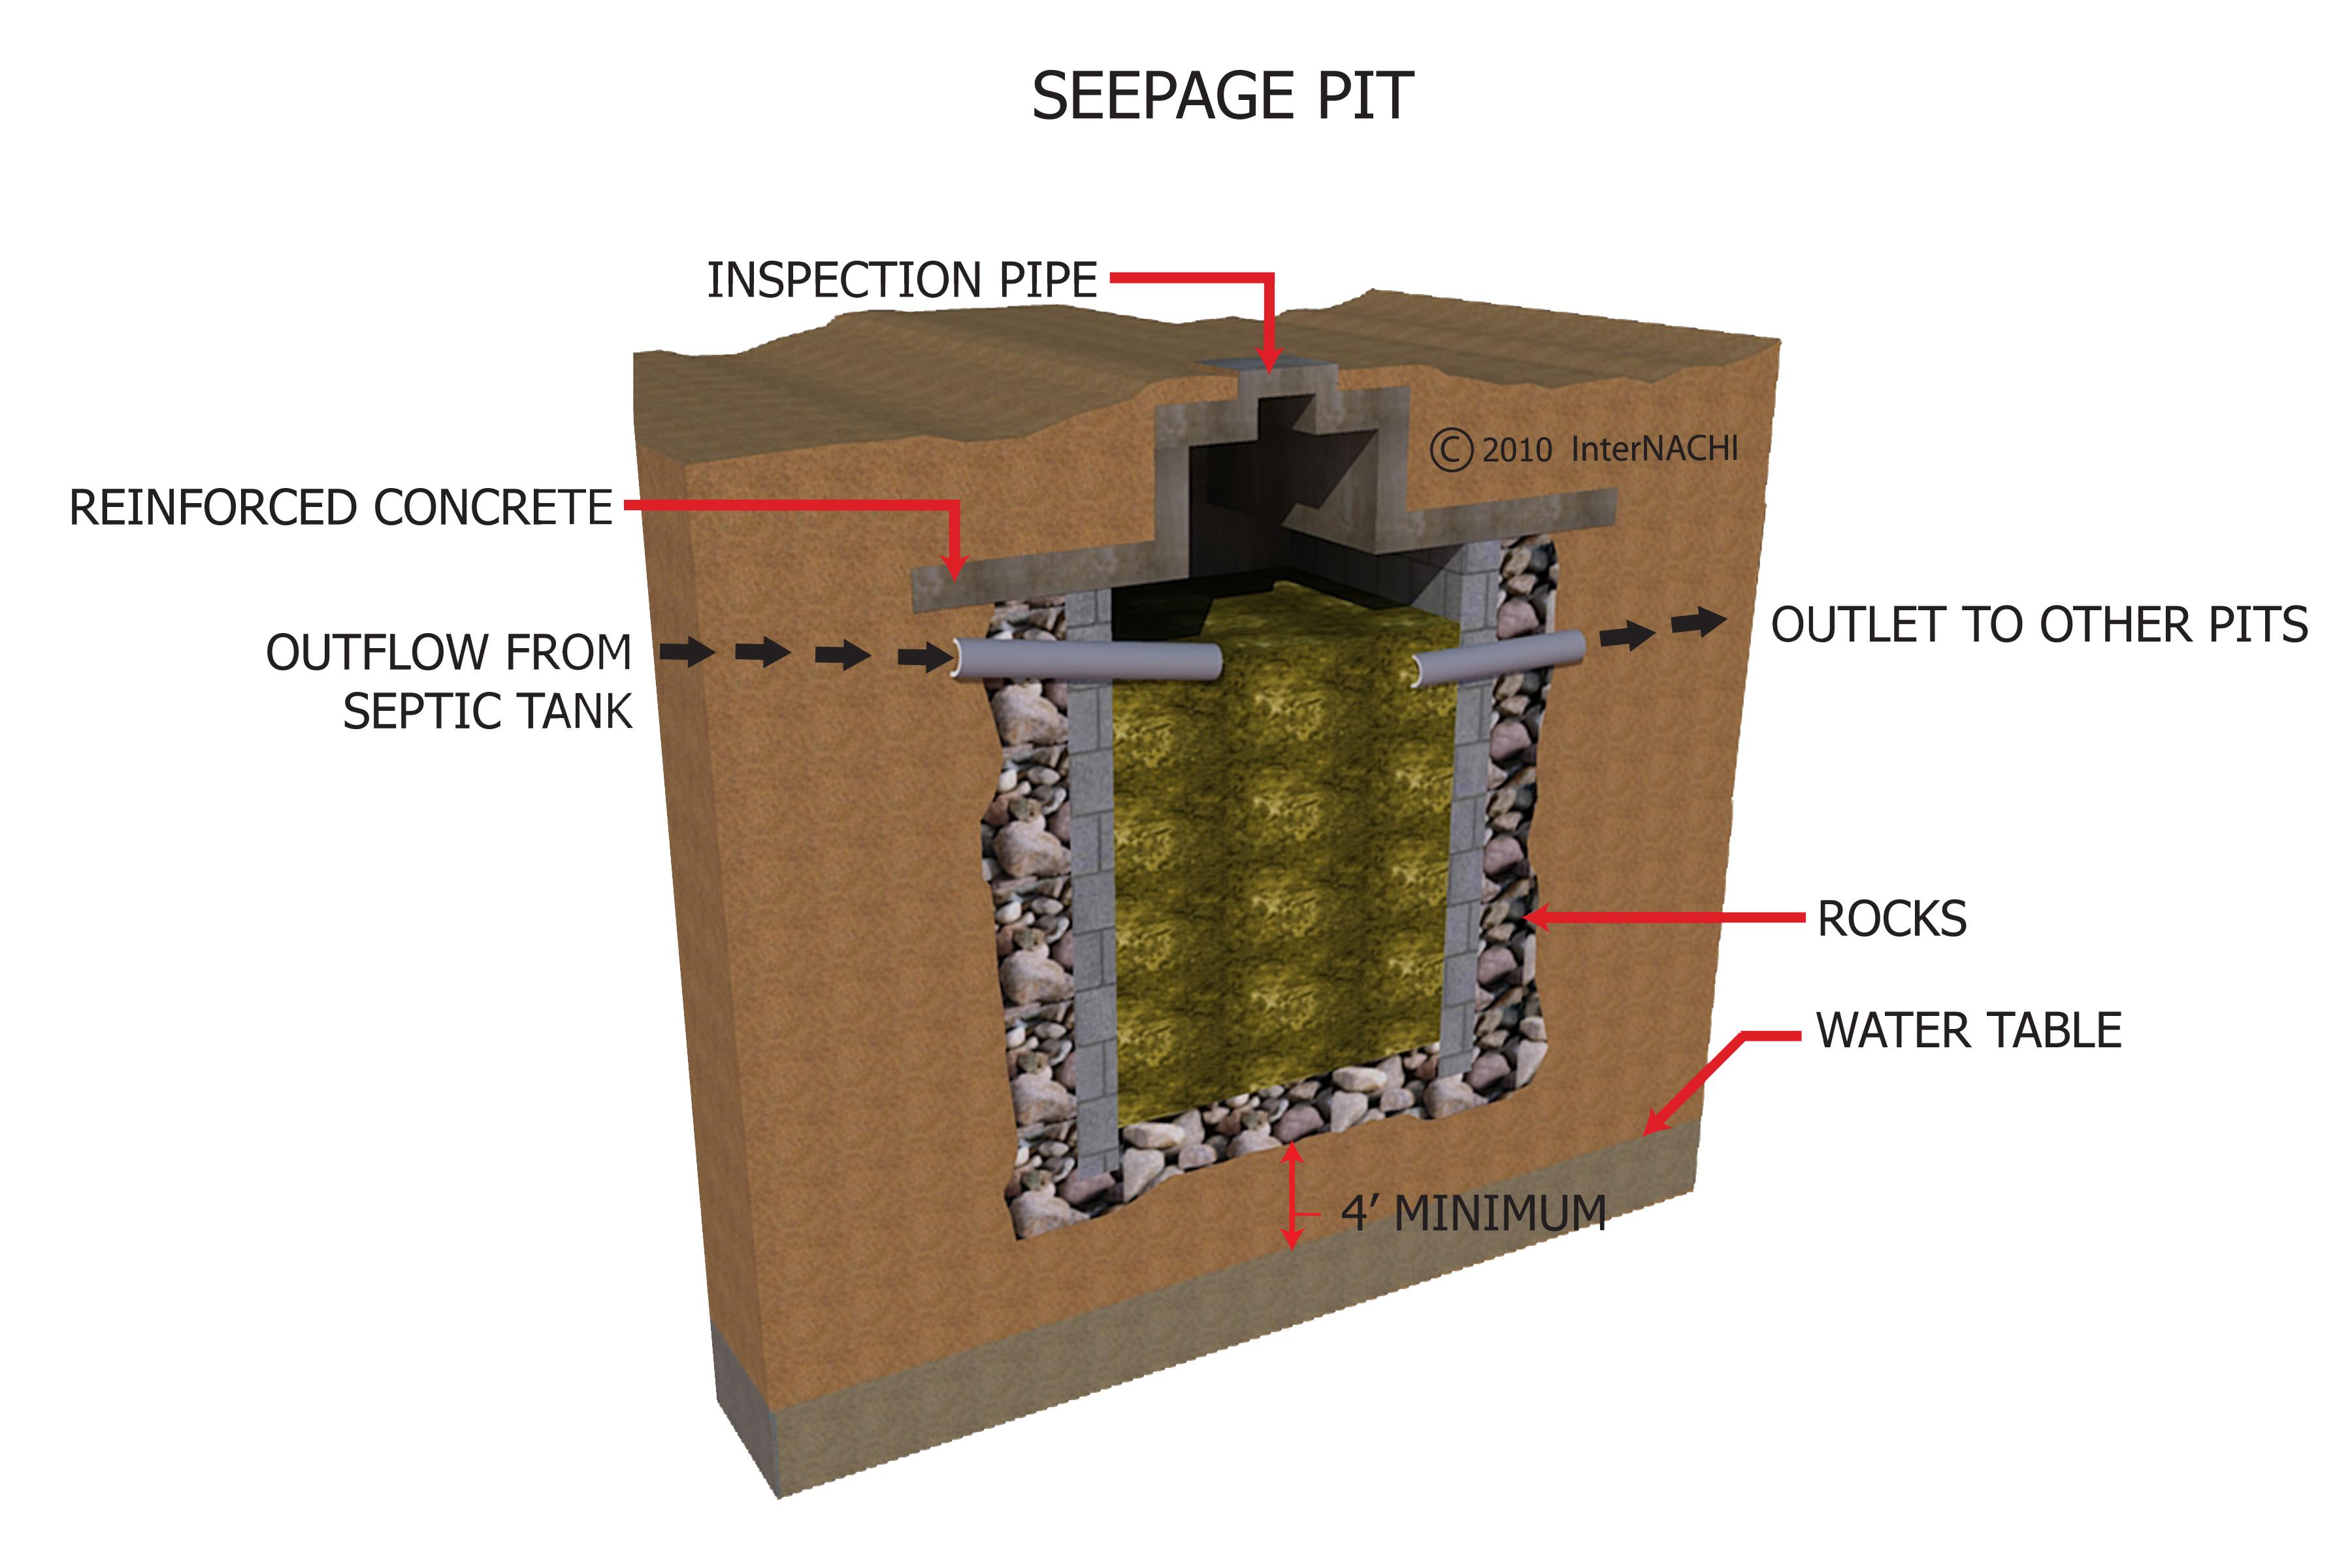 Seepage pit.